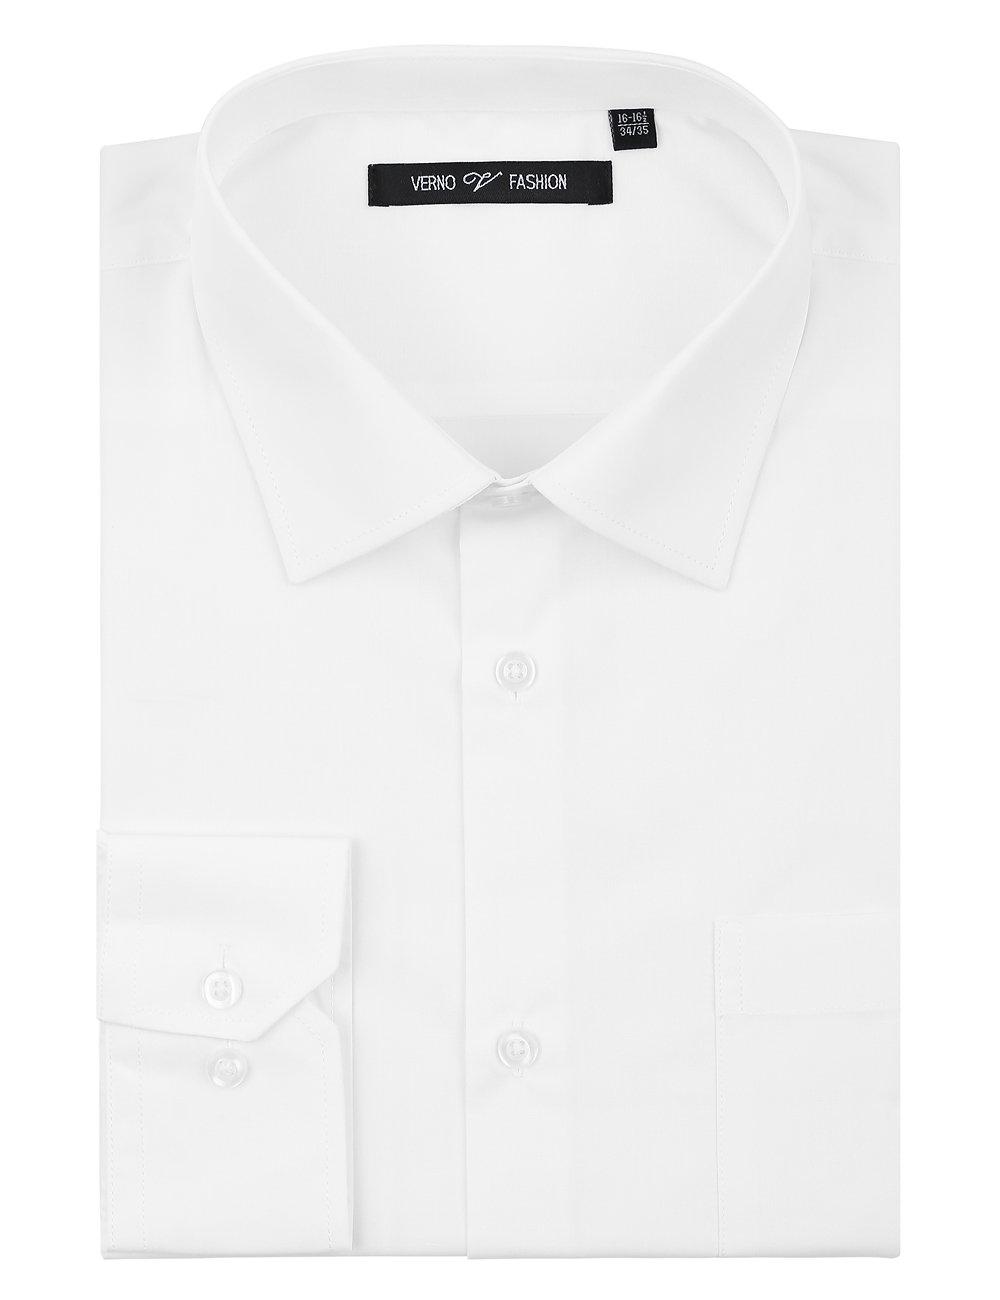 Verno Luxton MensRegular Fit Long Sleeve Dress Shirt, 19-19 1/2''Neck-34/35''Sleeve, White